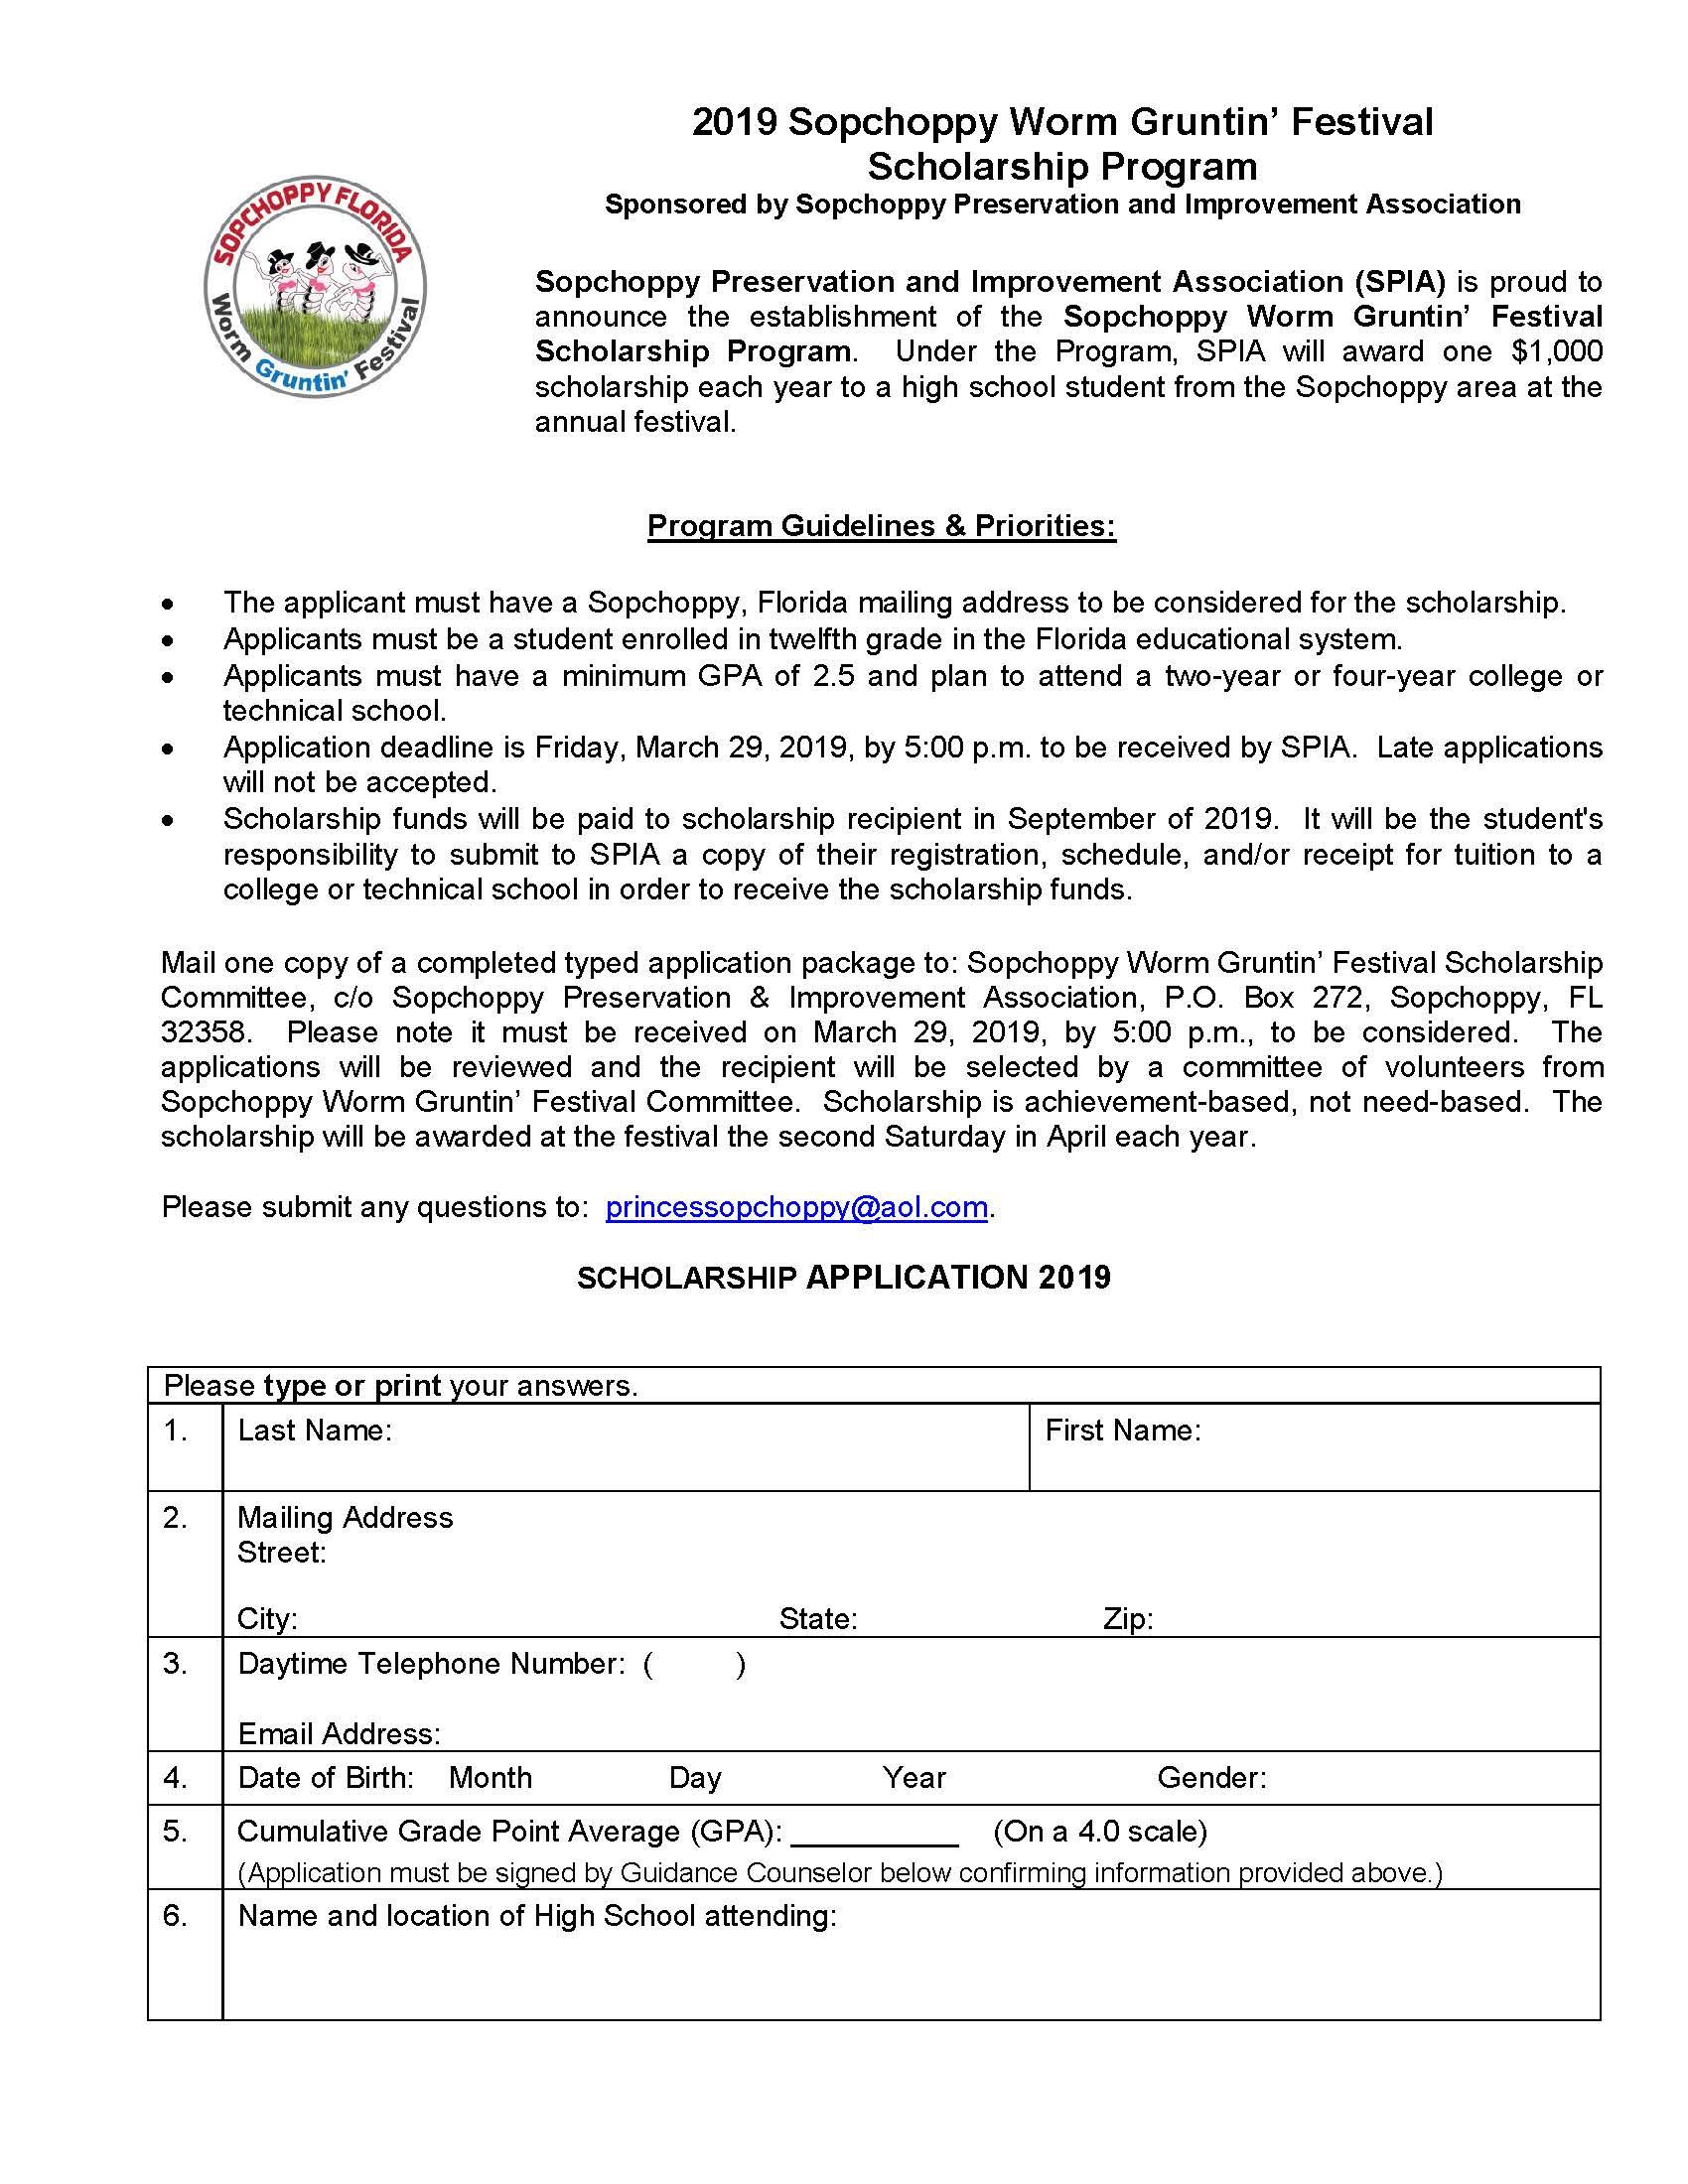 2019 Worm Gruntin' Festival Scholarship Application